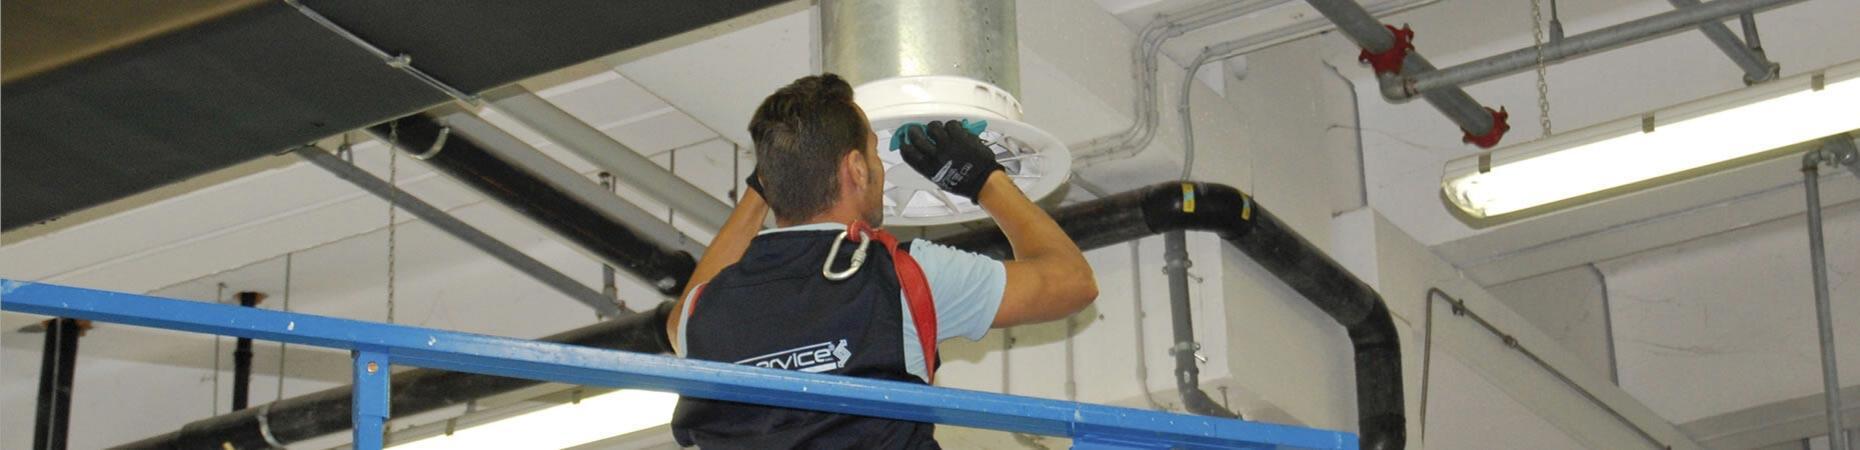 ecoservice-reggioemilia it impresa-di-pulizie-industrie-reggio-emilia 005